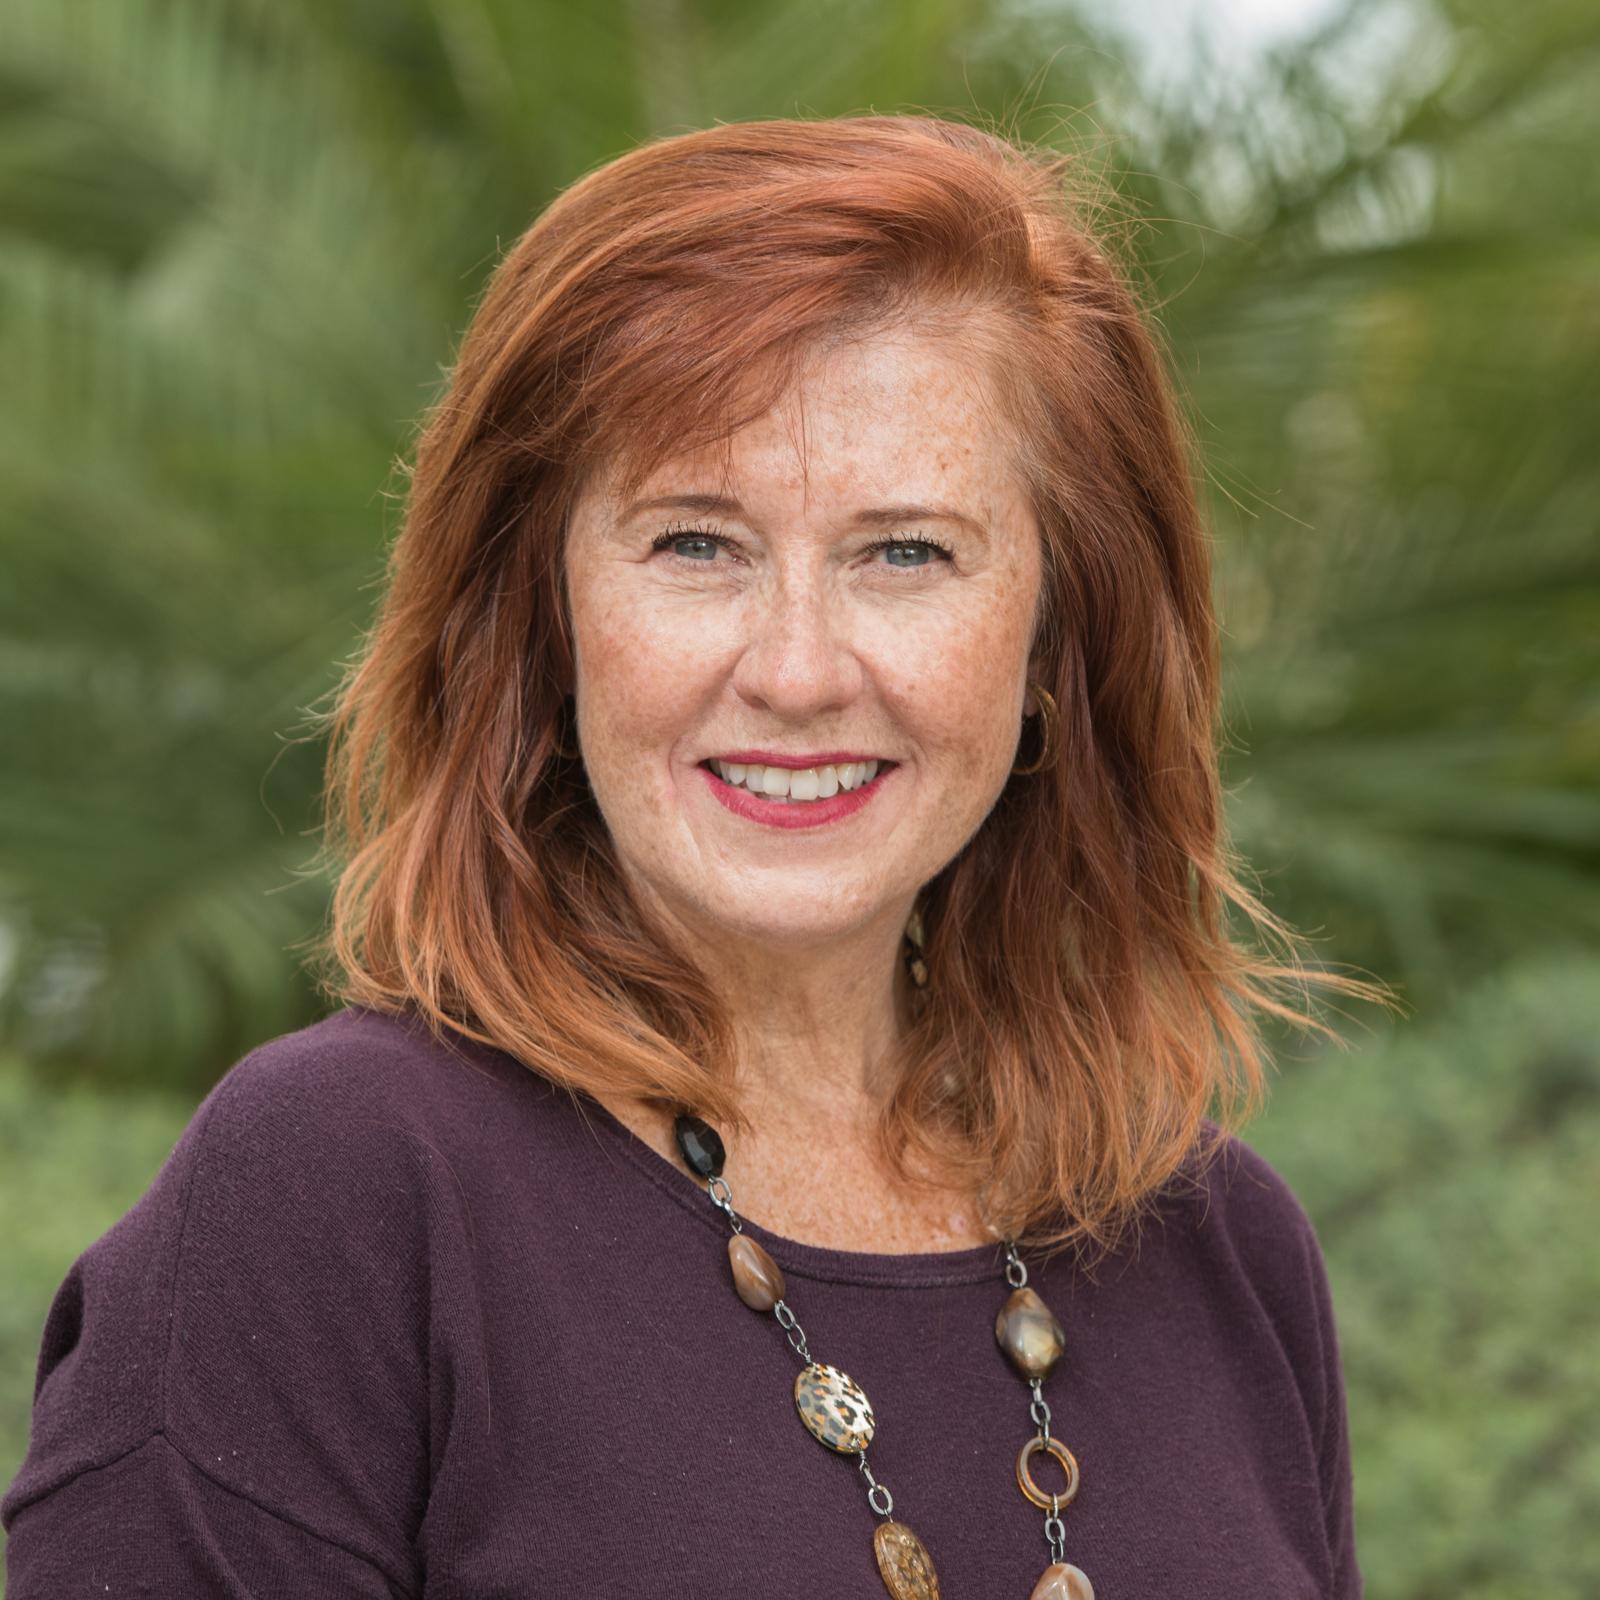 Sandra Dill